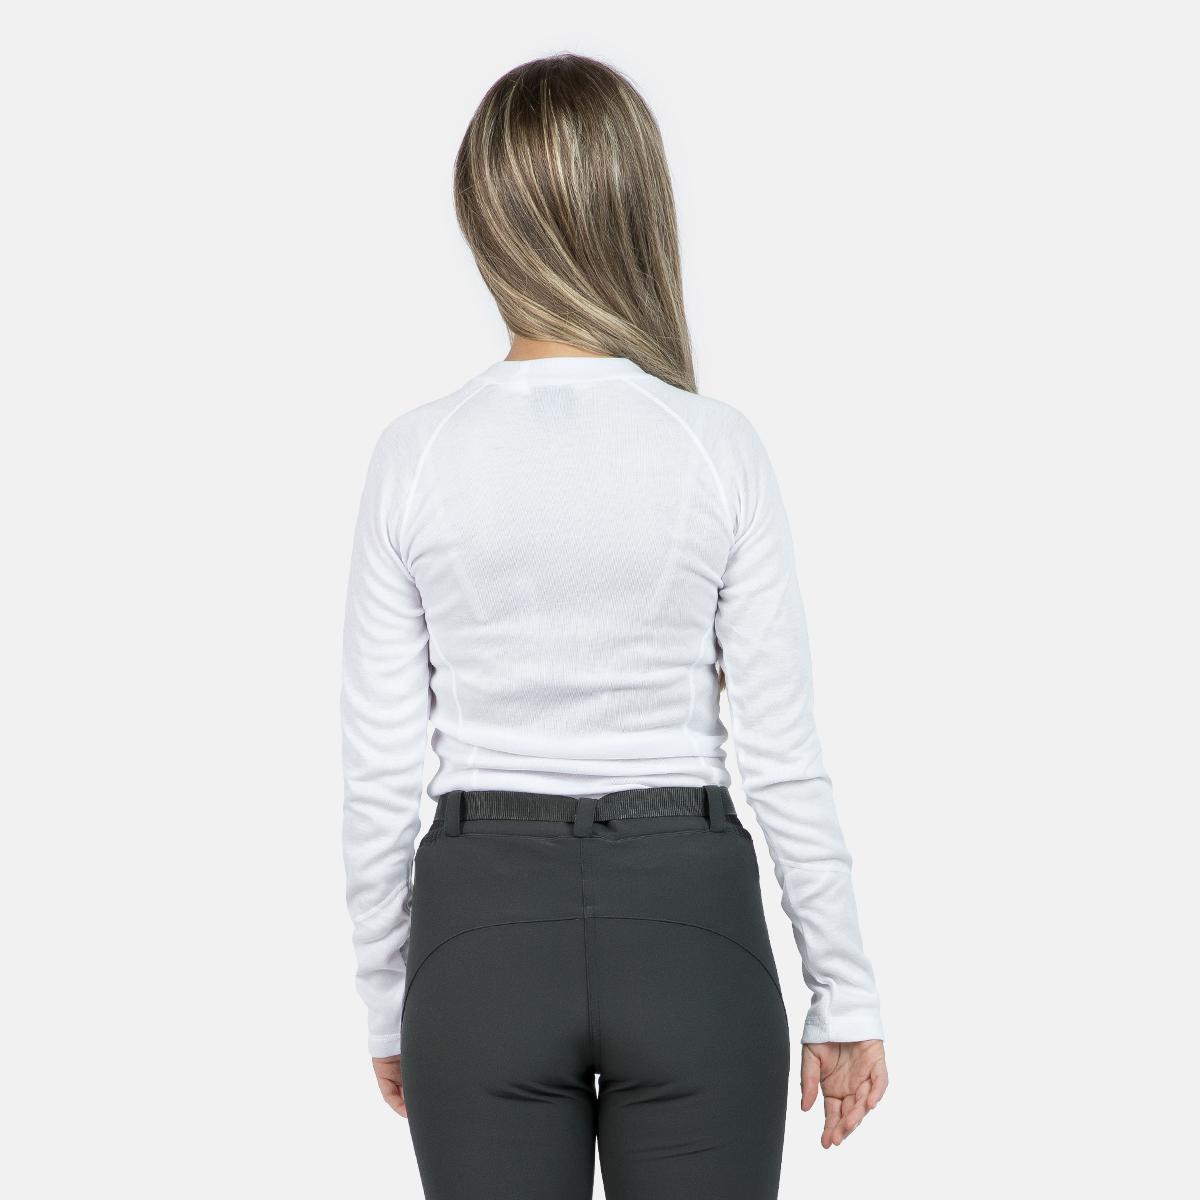 WOMAN'S ANAGA THERMAL T-SHIRT WHITE